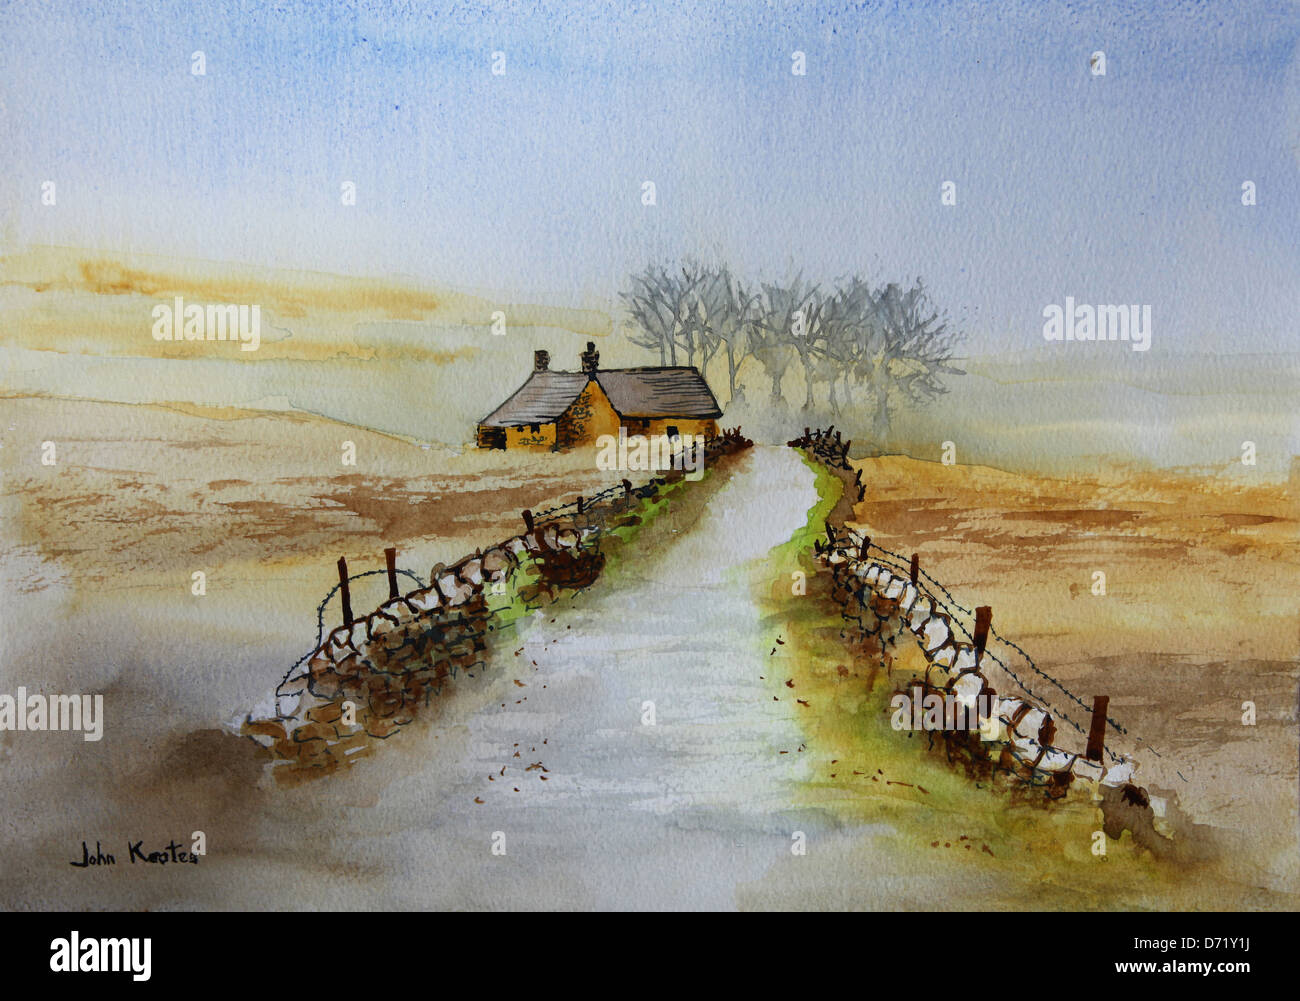 original-watercolour-landscape-painting-by-the-artist-john-keates-D71Y1J.jpg